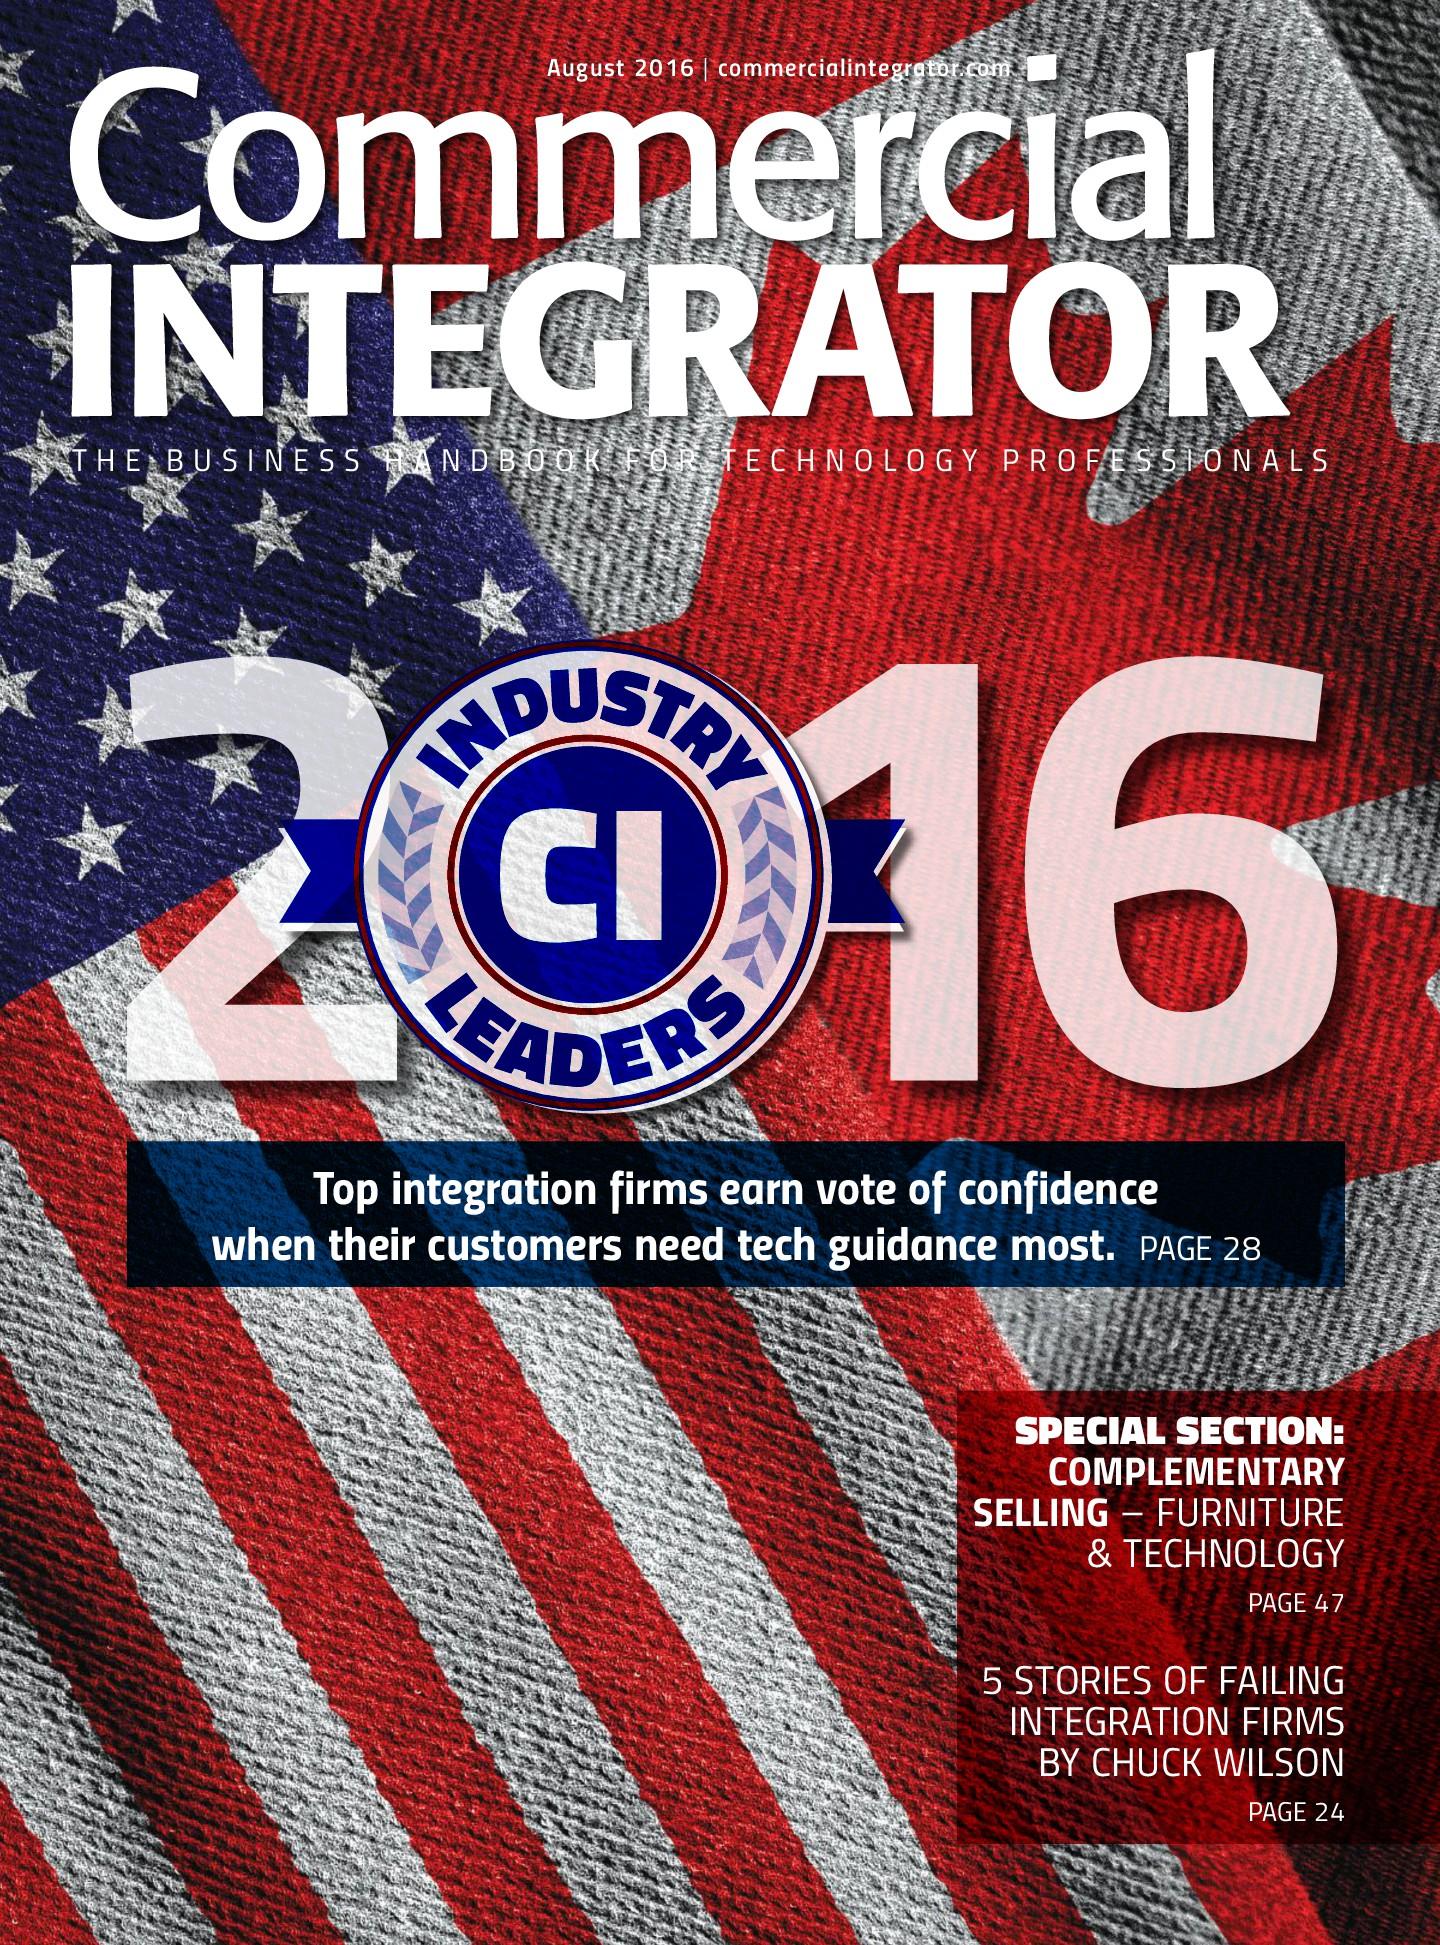 2016-Top-Integrator-Award-Commercial-Integrator